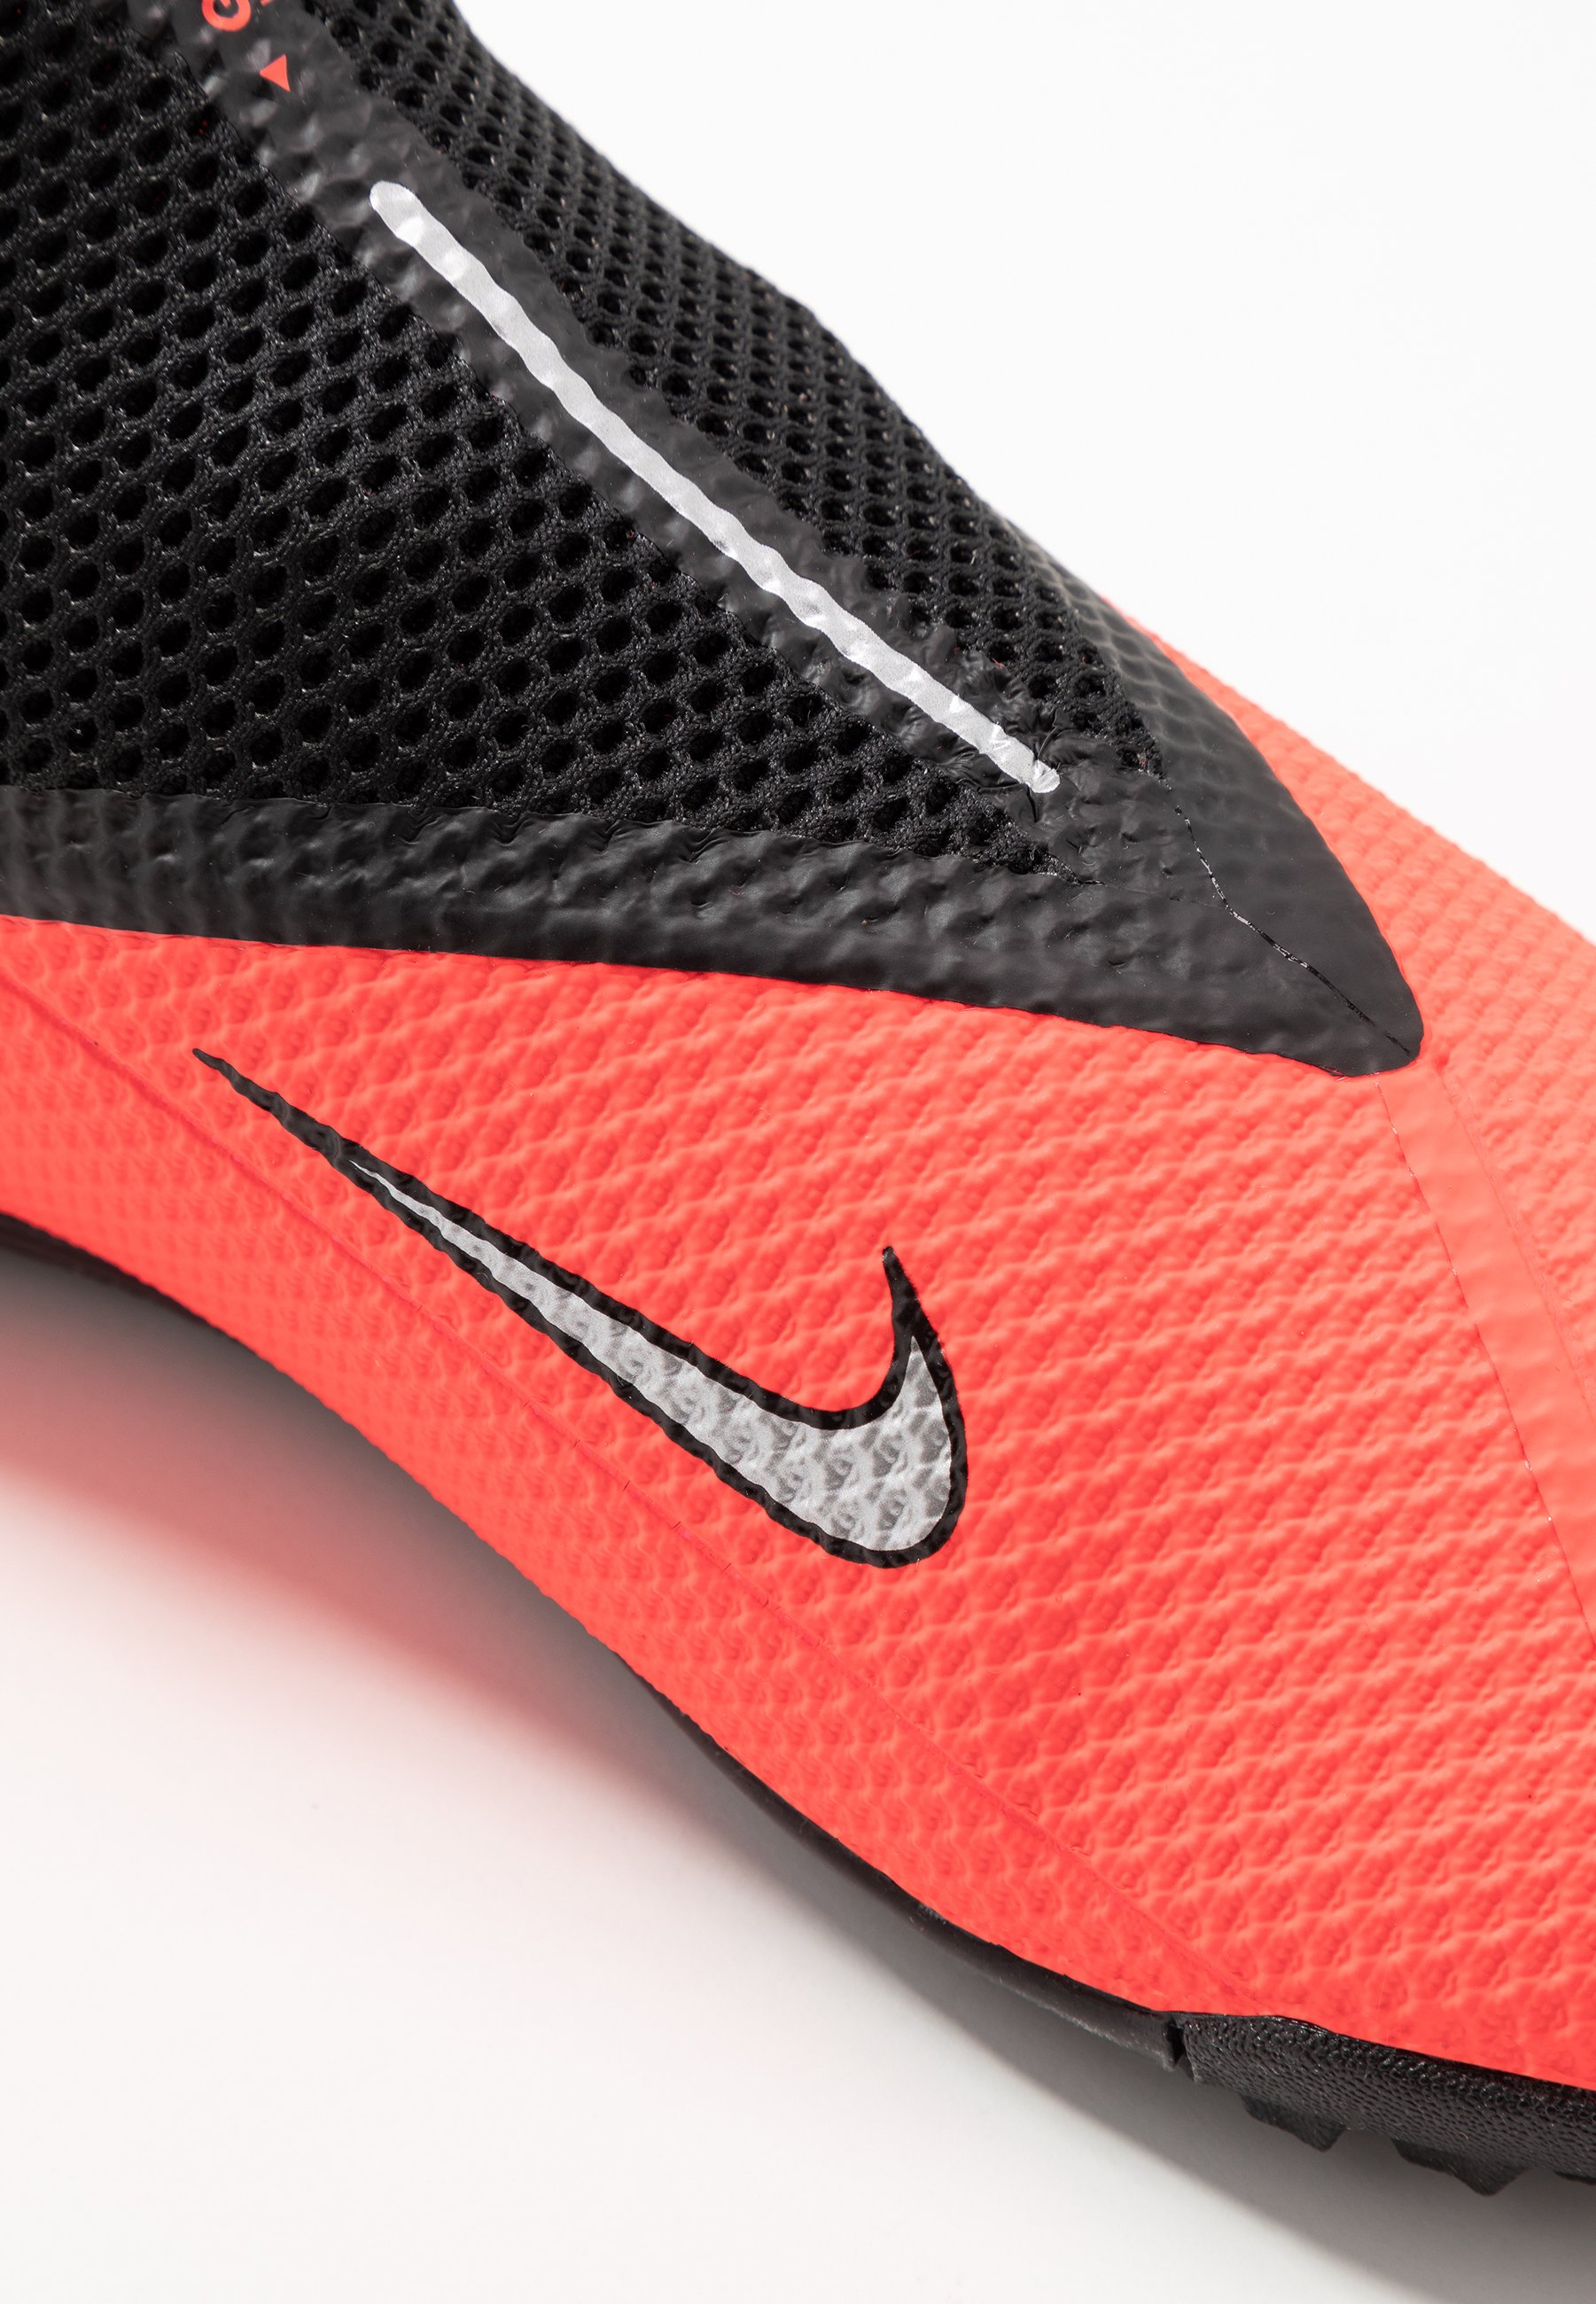 Nike Performance PHANTOM VISION 2 ACADEMY DF TF - Fodboldstøvler m/ multi knobber - laser crimson/metallic silver/black